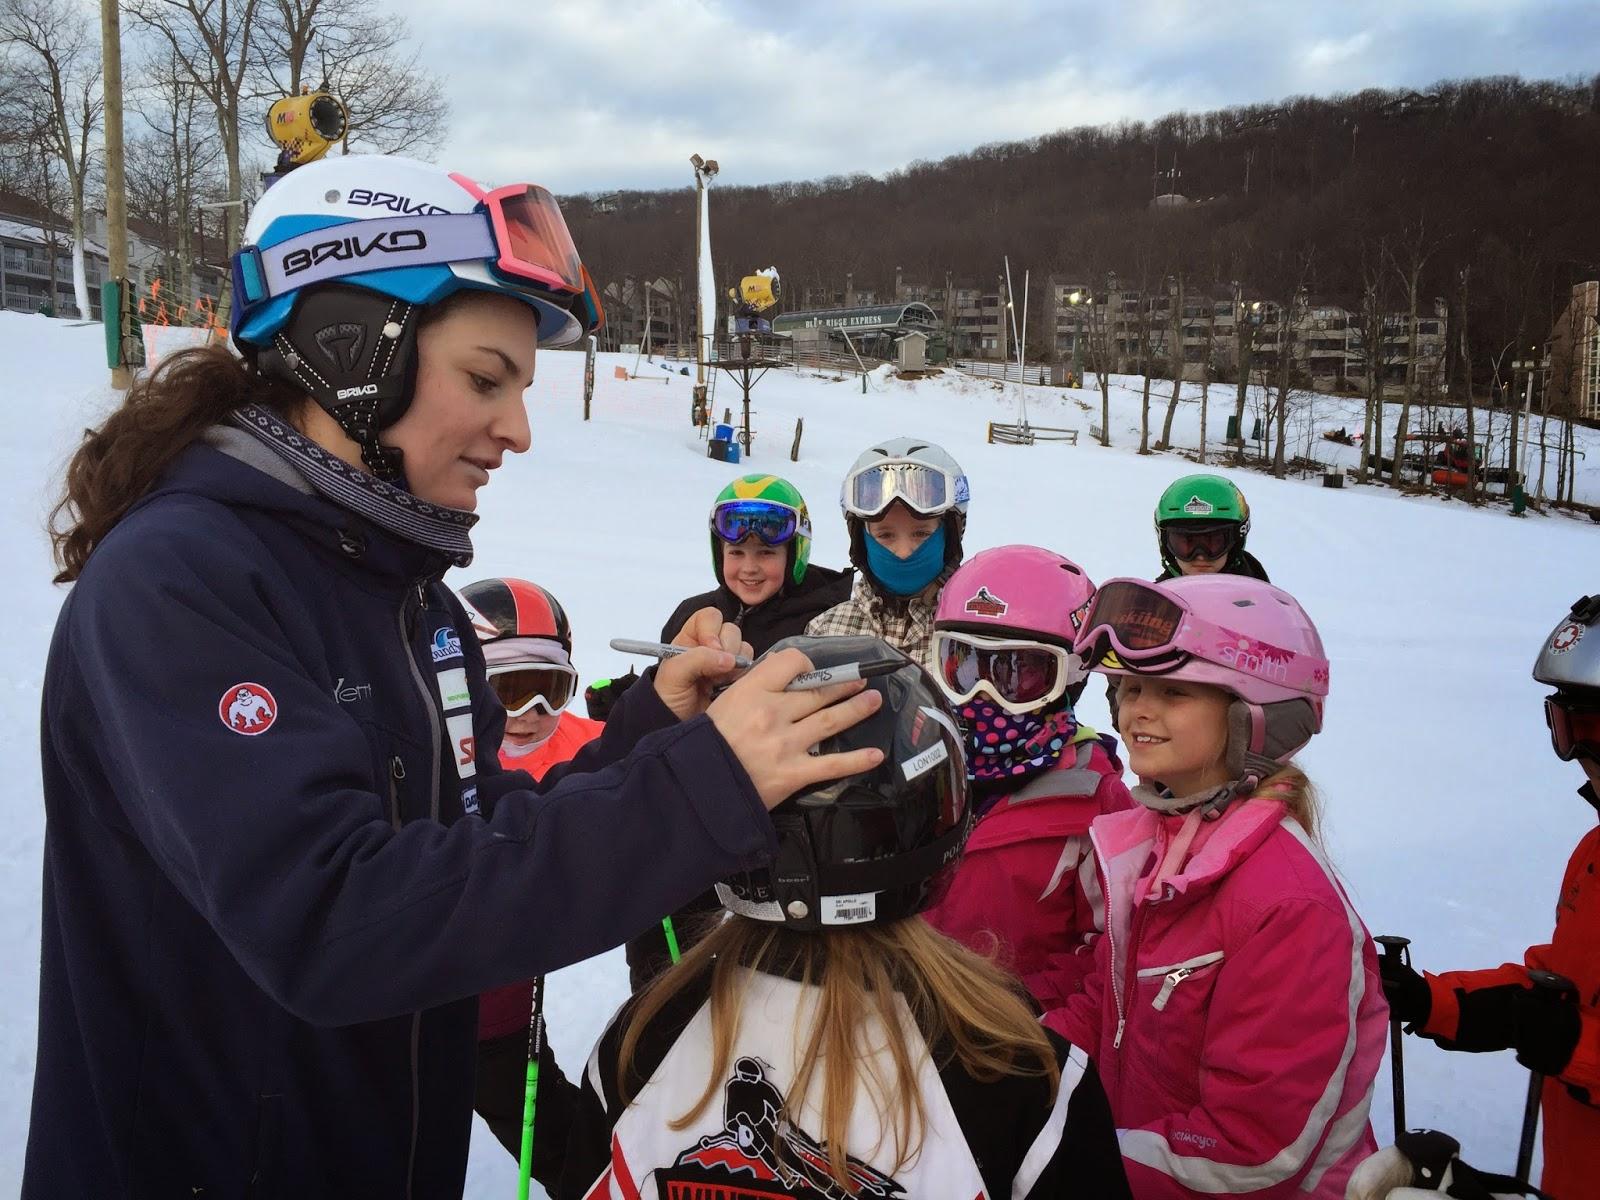 olympian, world cup skier, signature, helmets, Wintergreen Resort, McJames